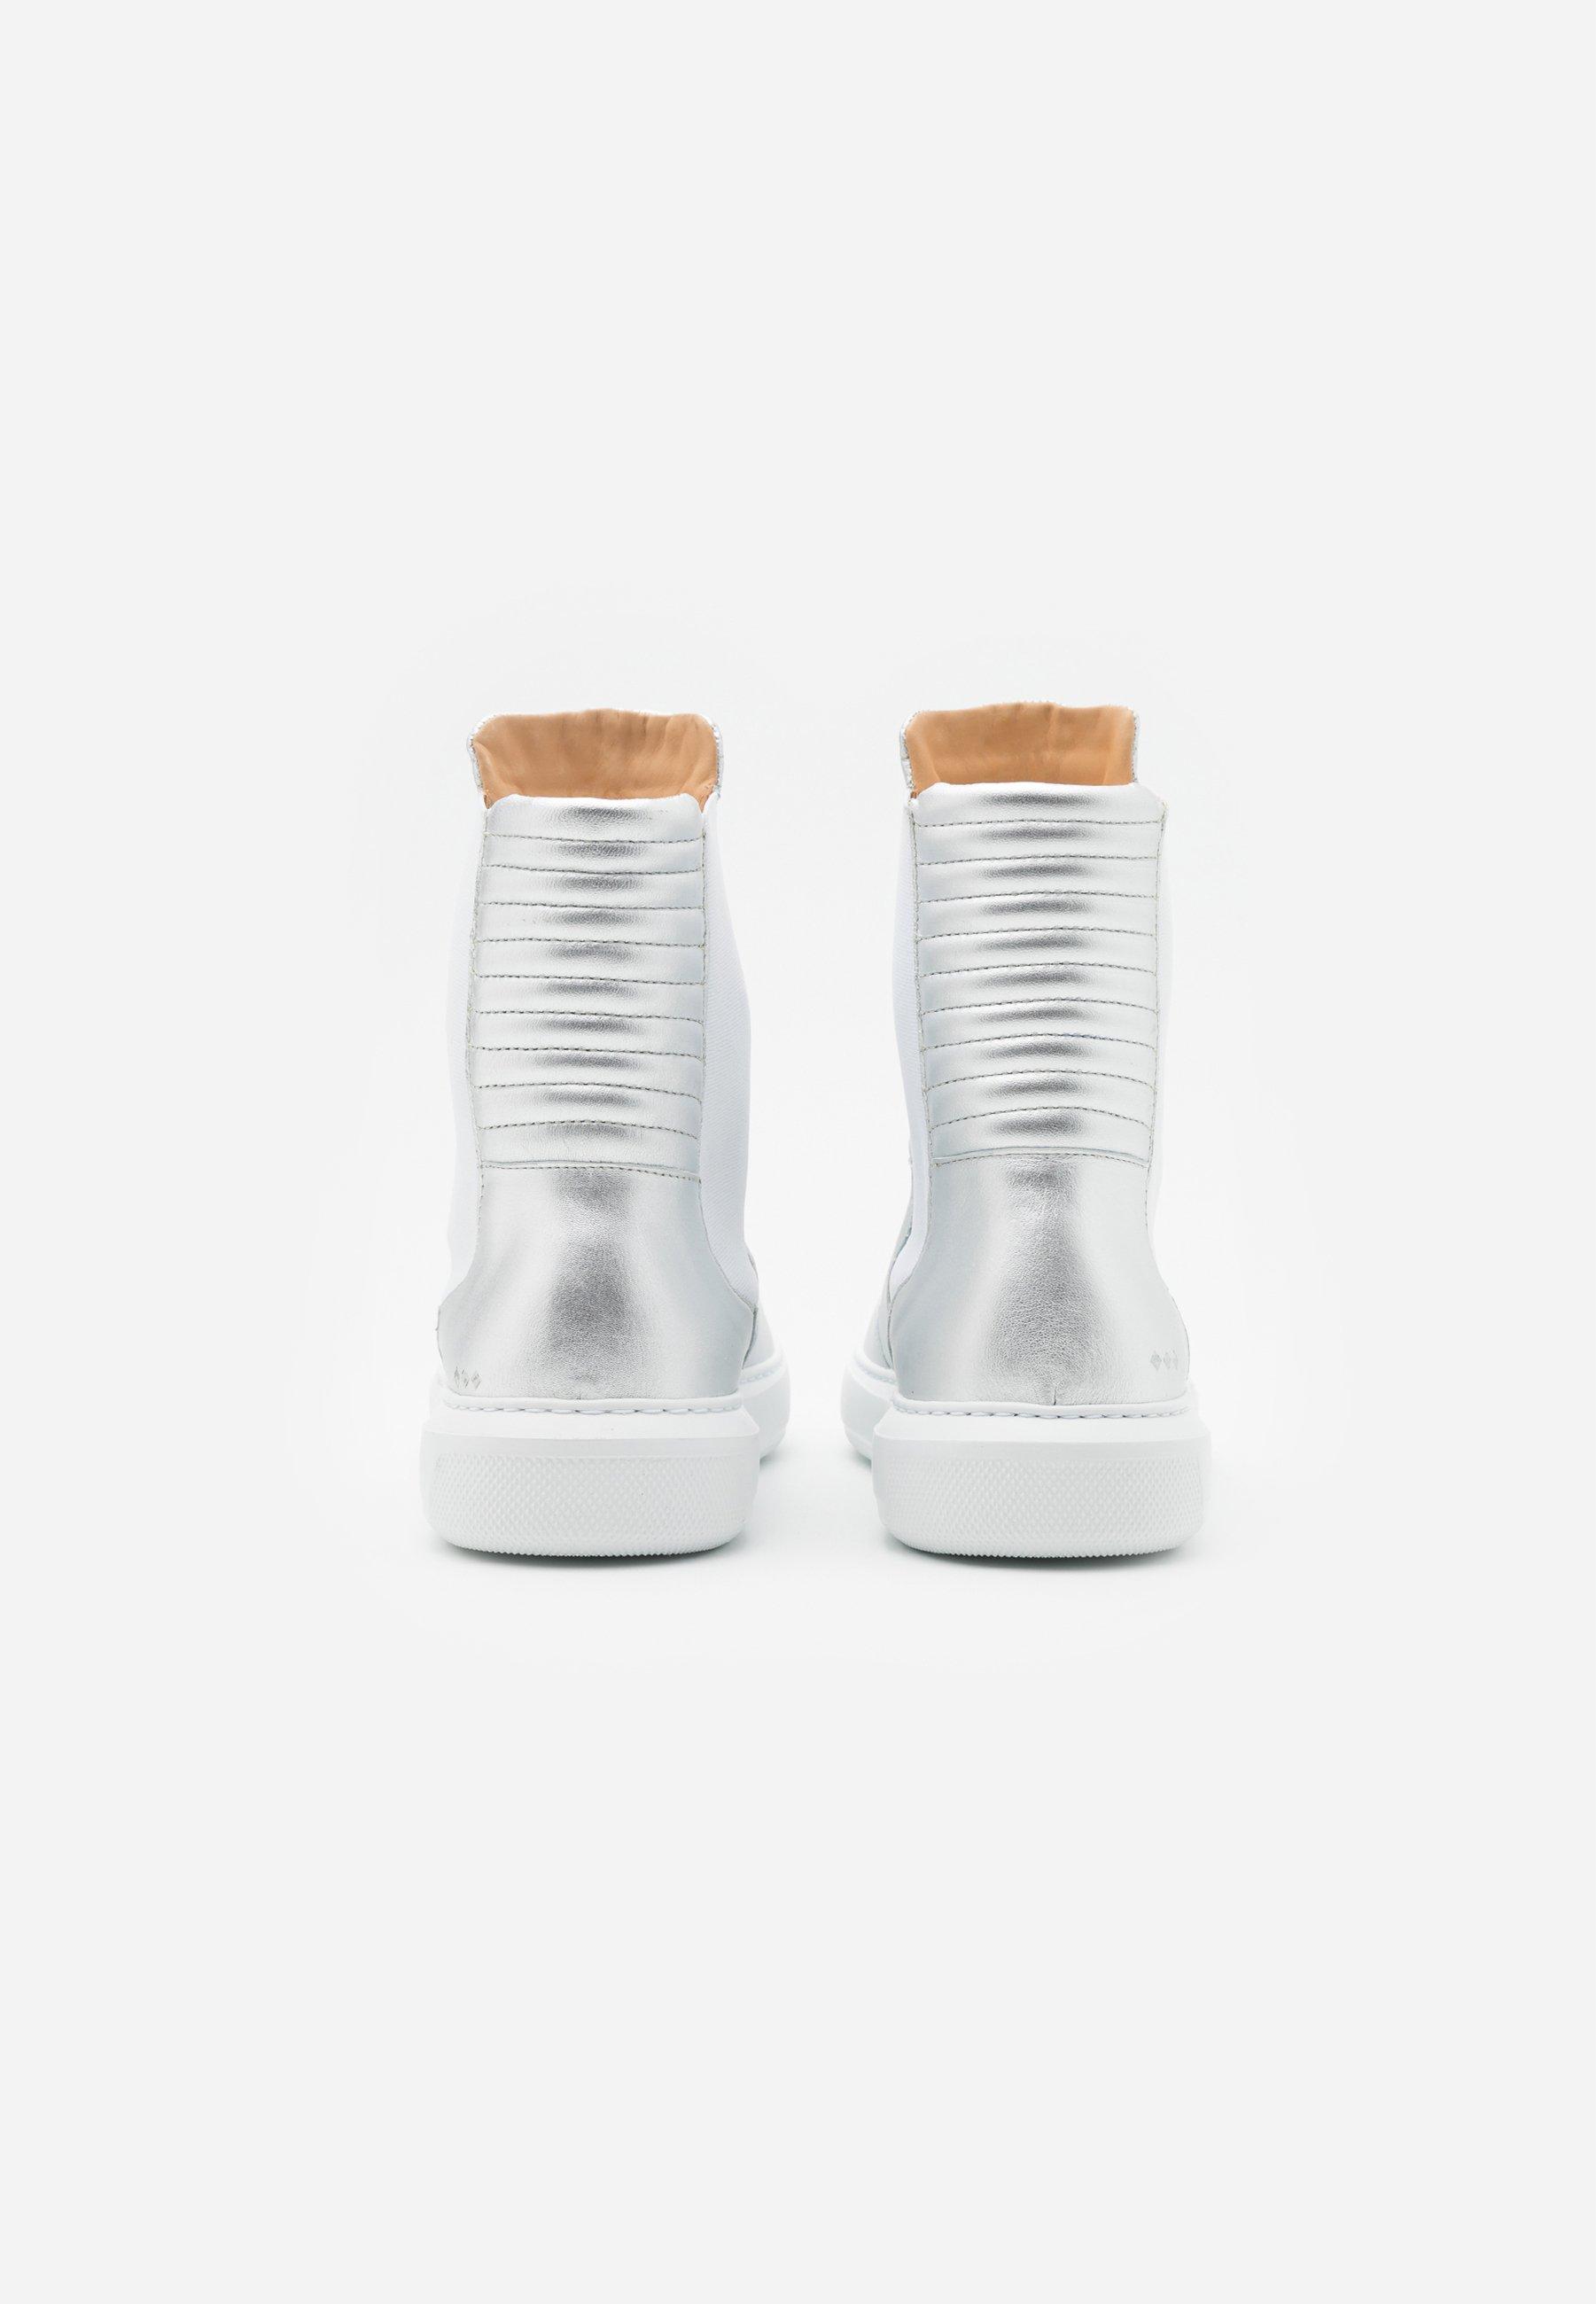 Quality Cheapest Royal RepubliQ COSMOS MISSION CHELSEA - Classic ankle boots - silver | men's shoes 2020 7rueN